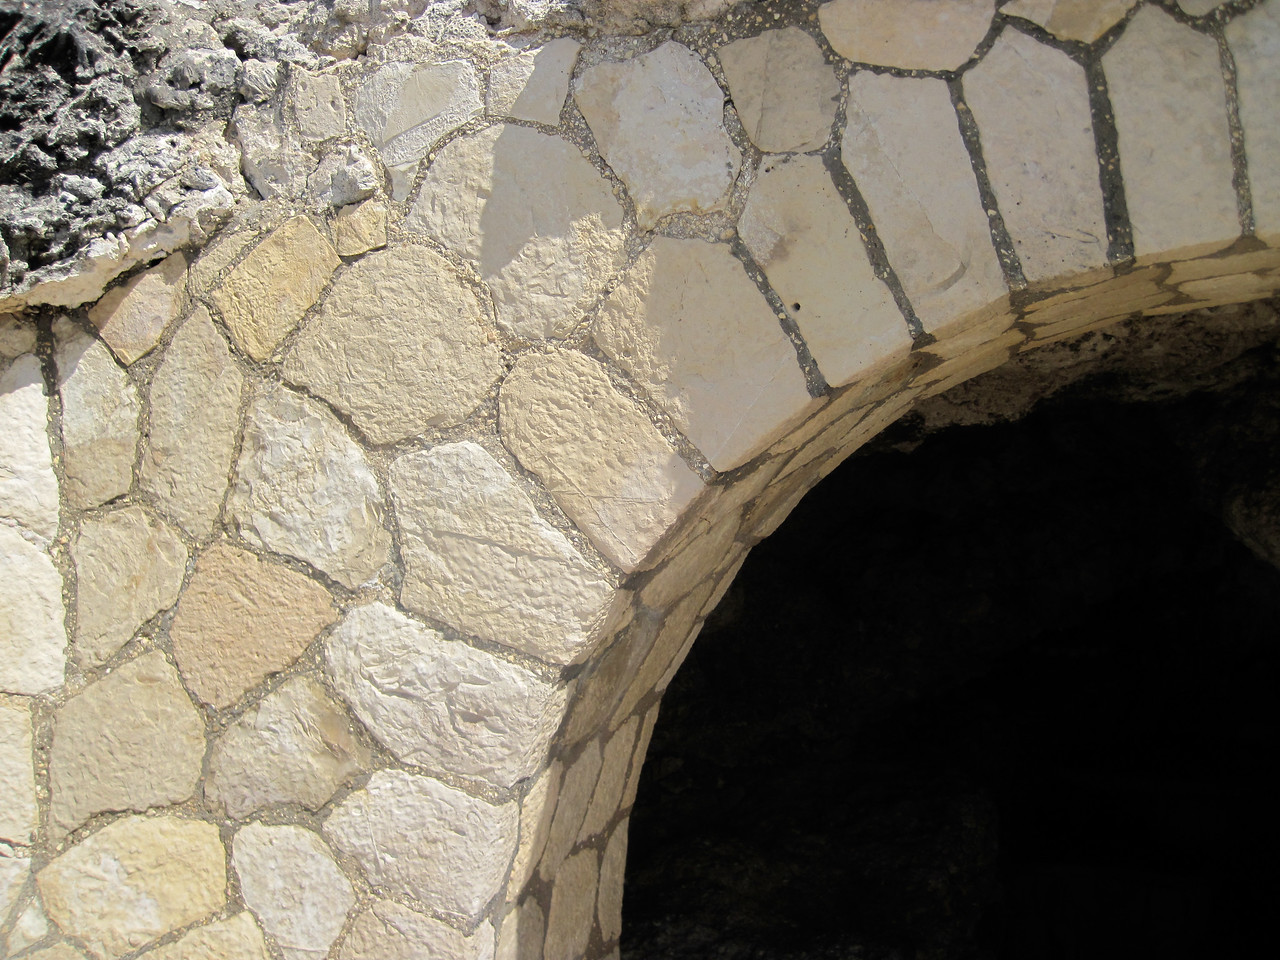 Moonbeam Cave Archway